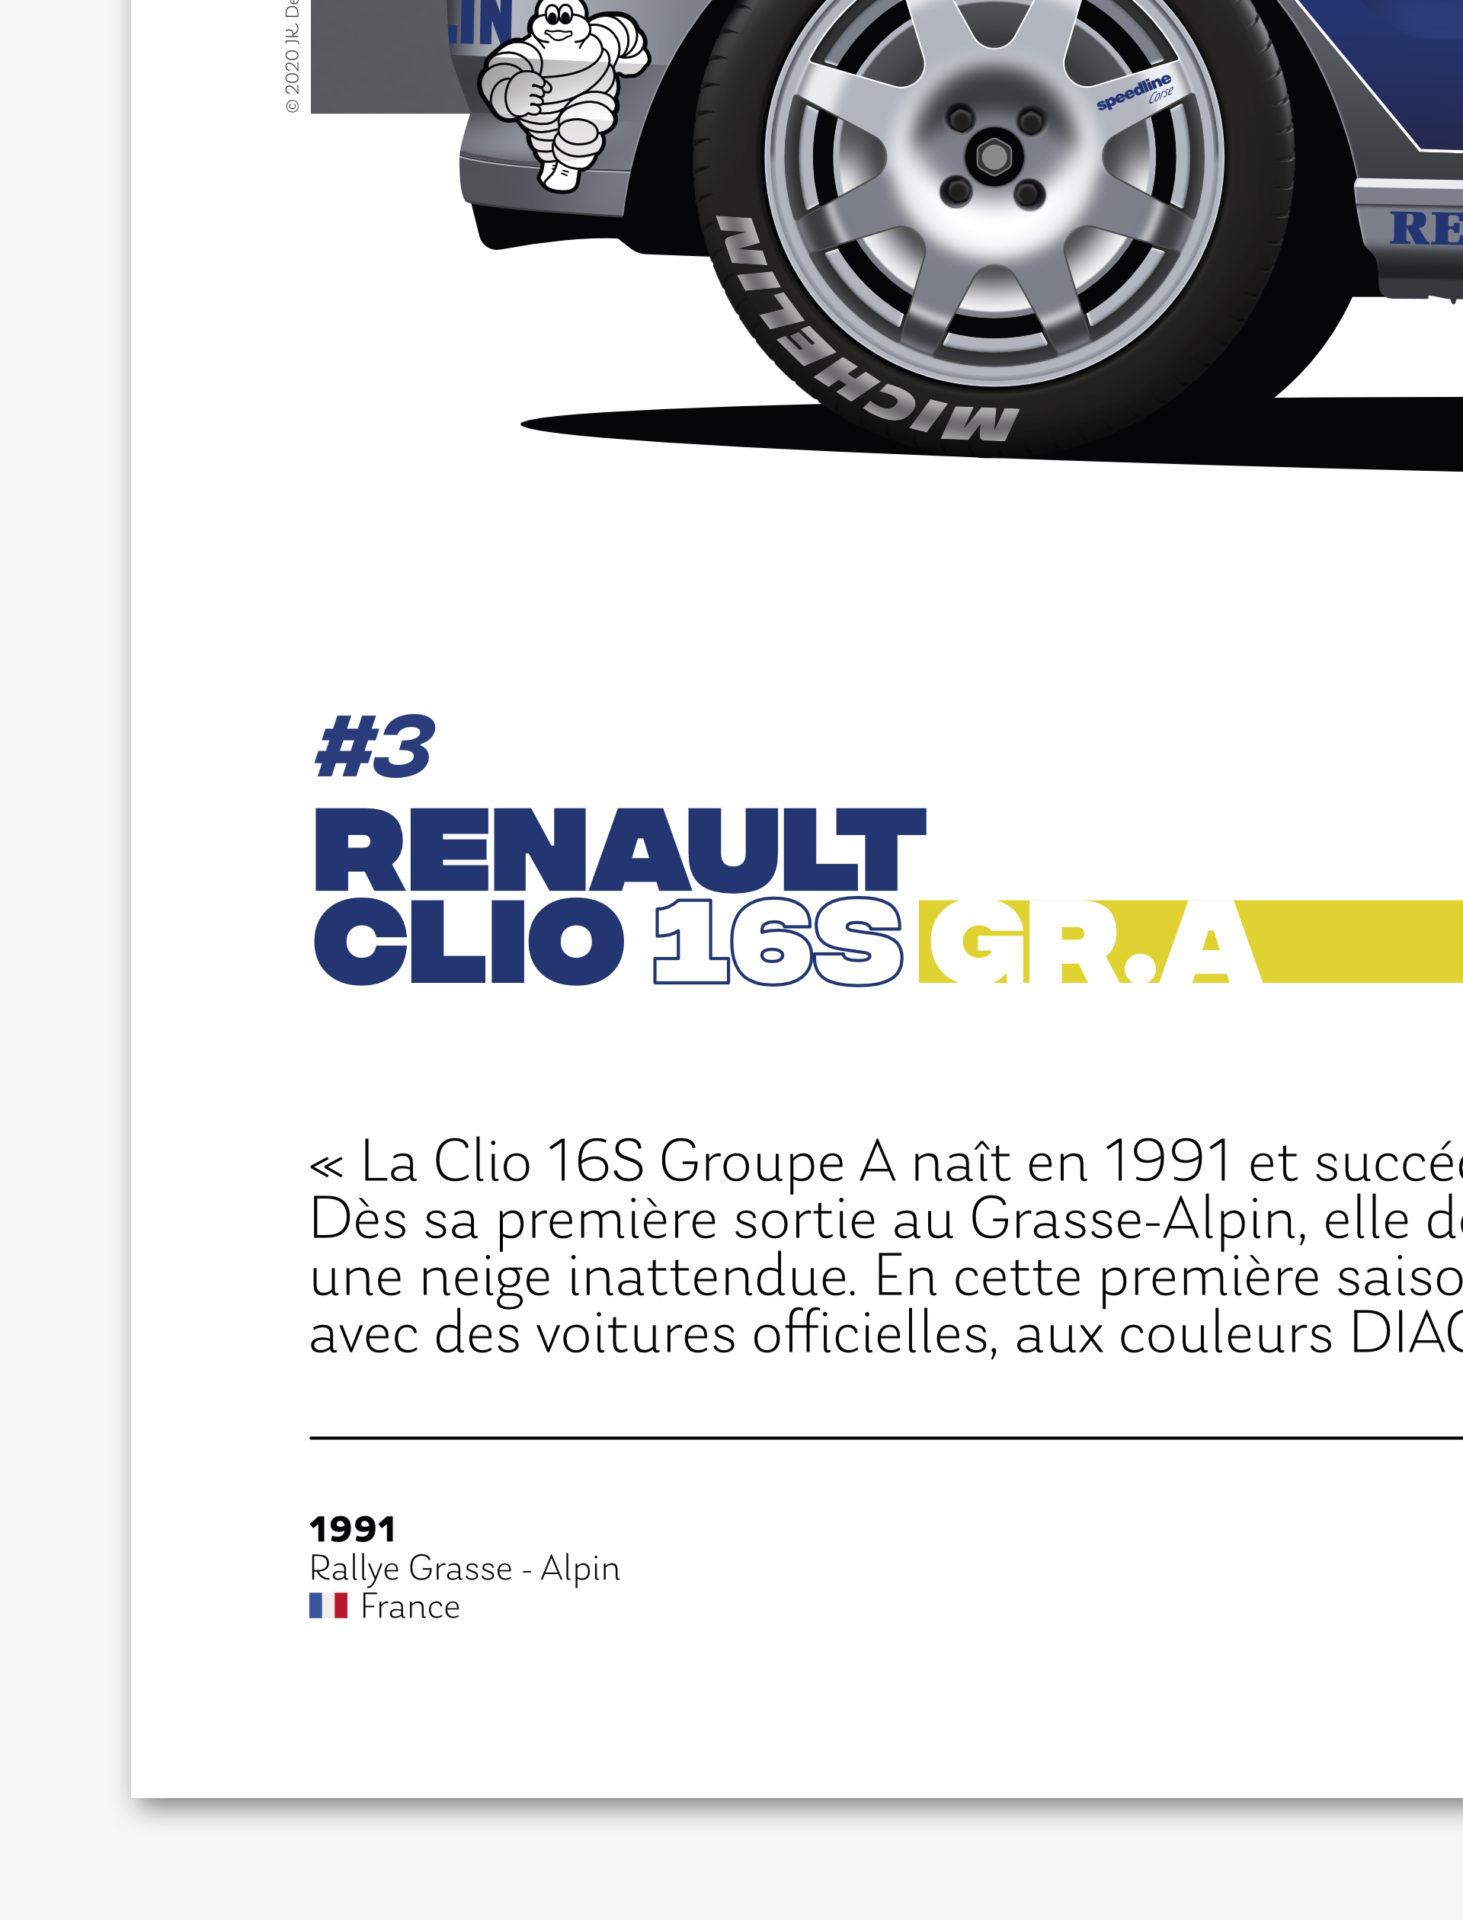 Jk Design - Clio 16s DIAC - 12